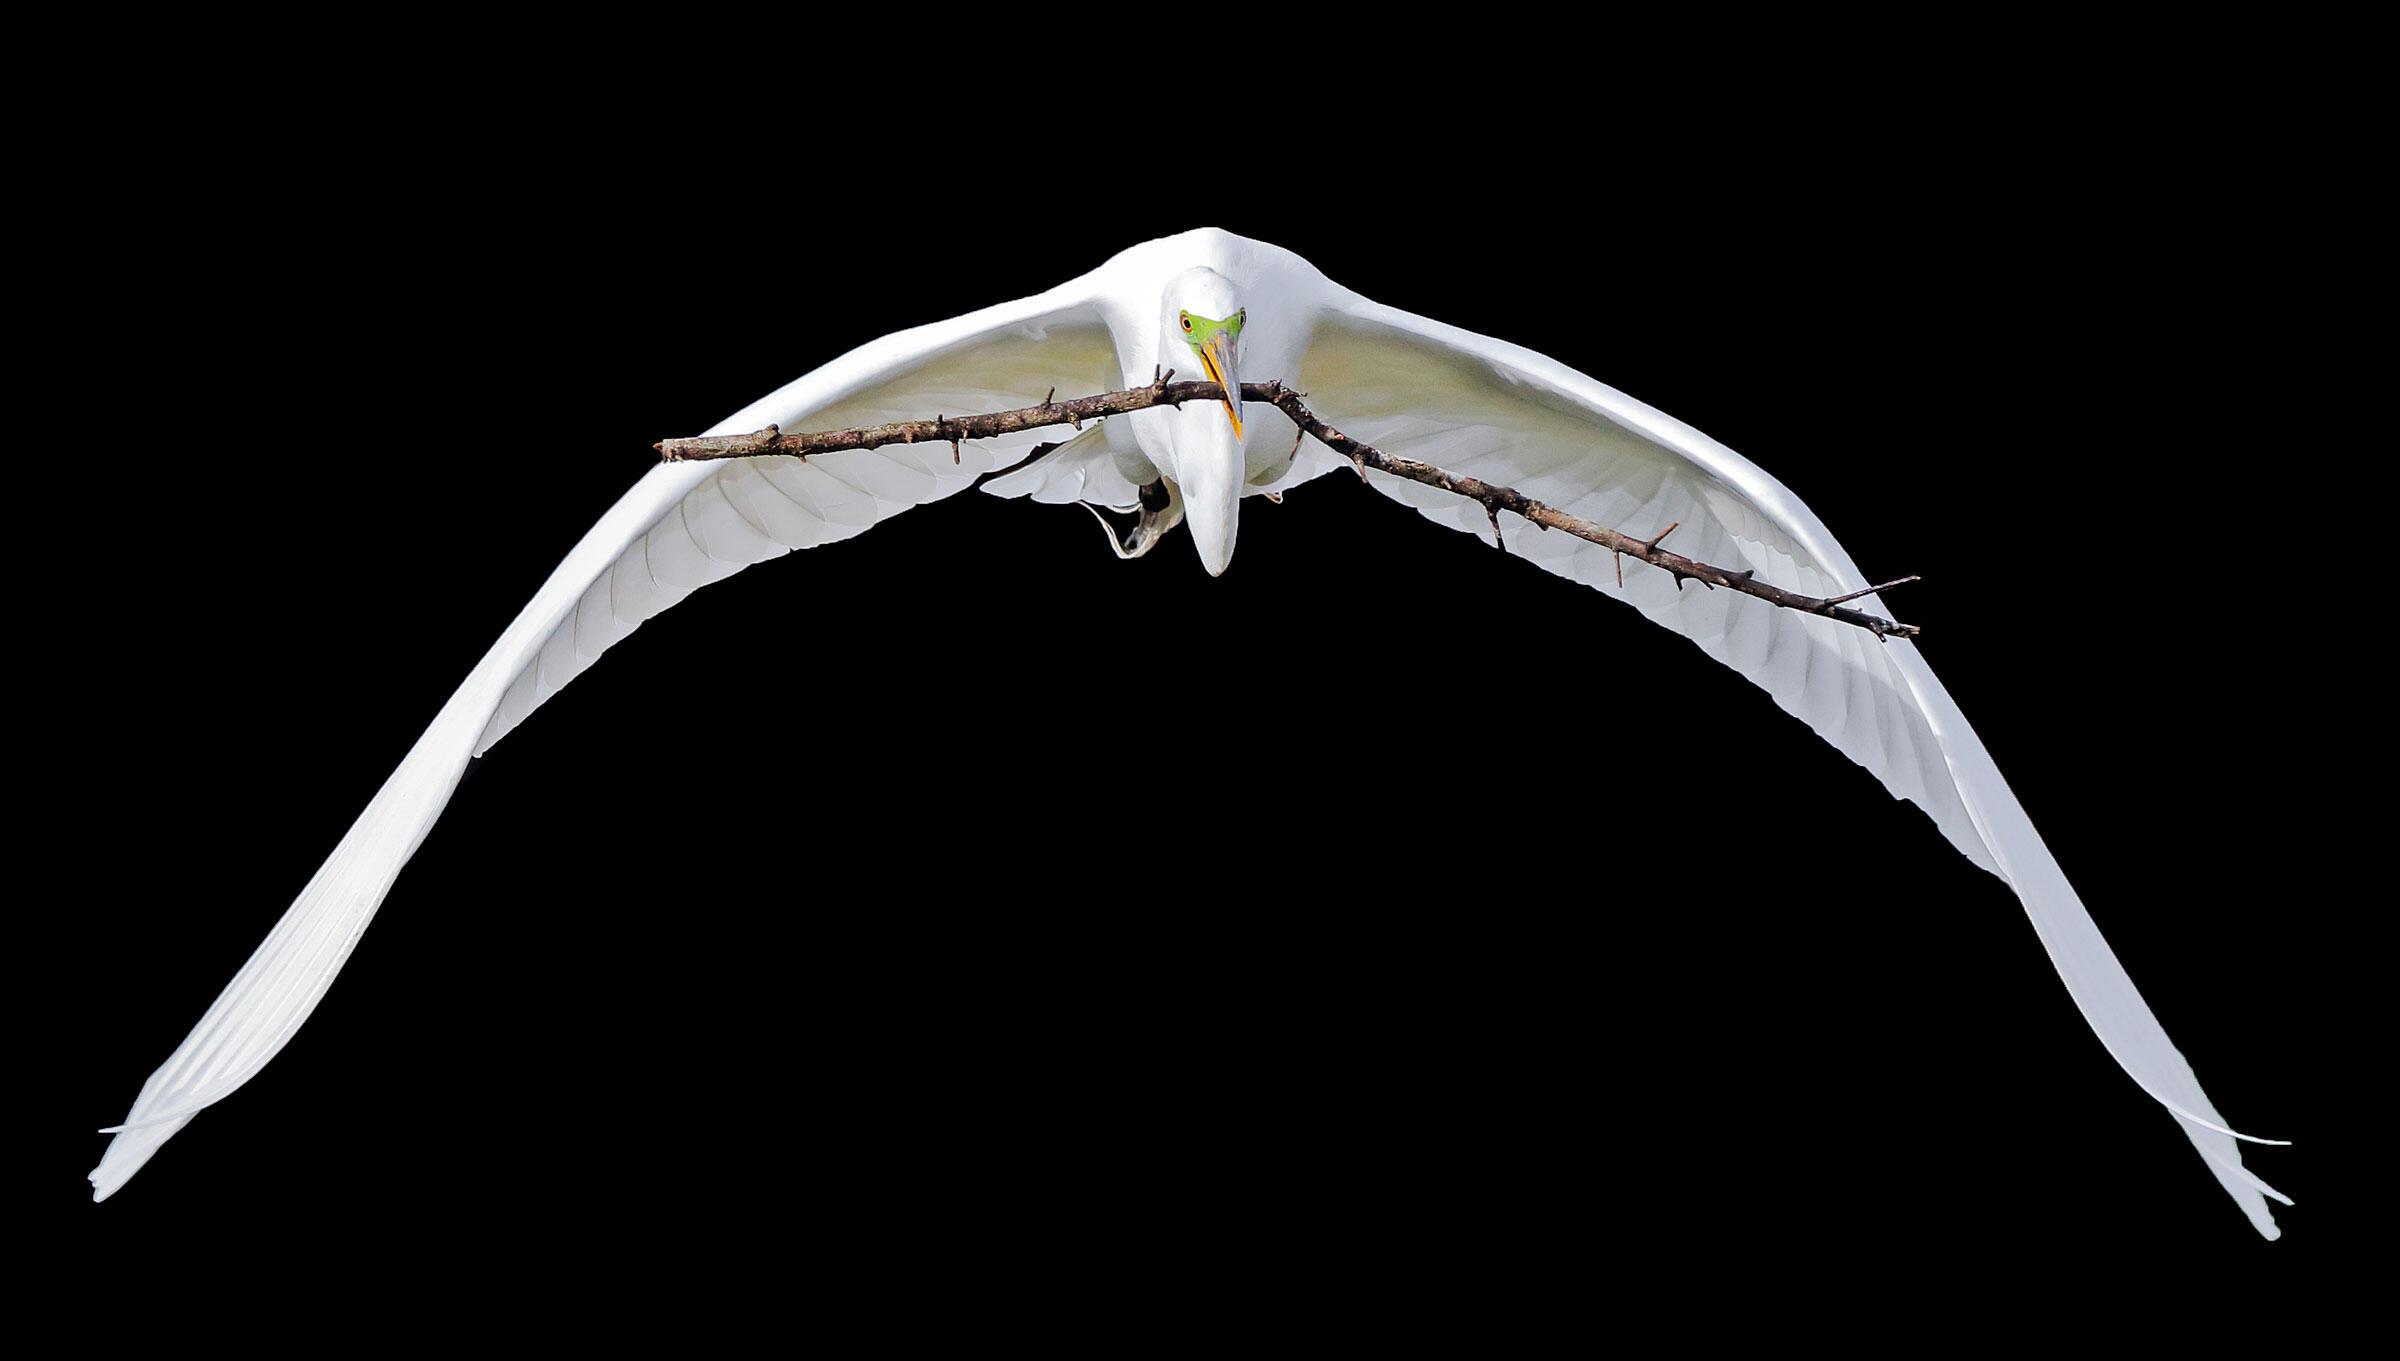 Great Egret/Fine Art Category. Veronique Viardin/Audubon Photography Awards